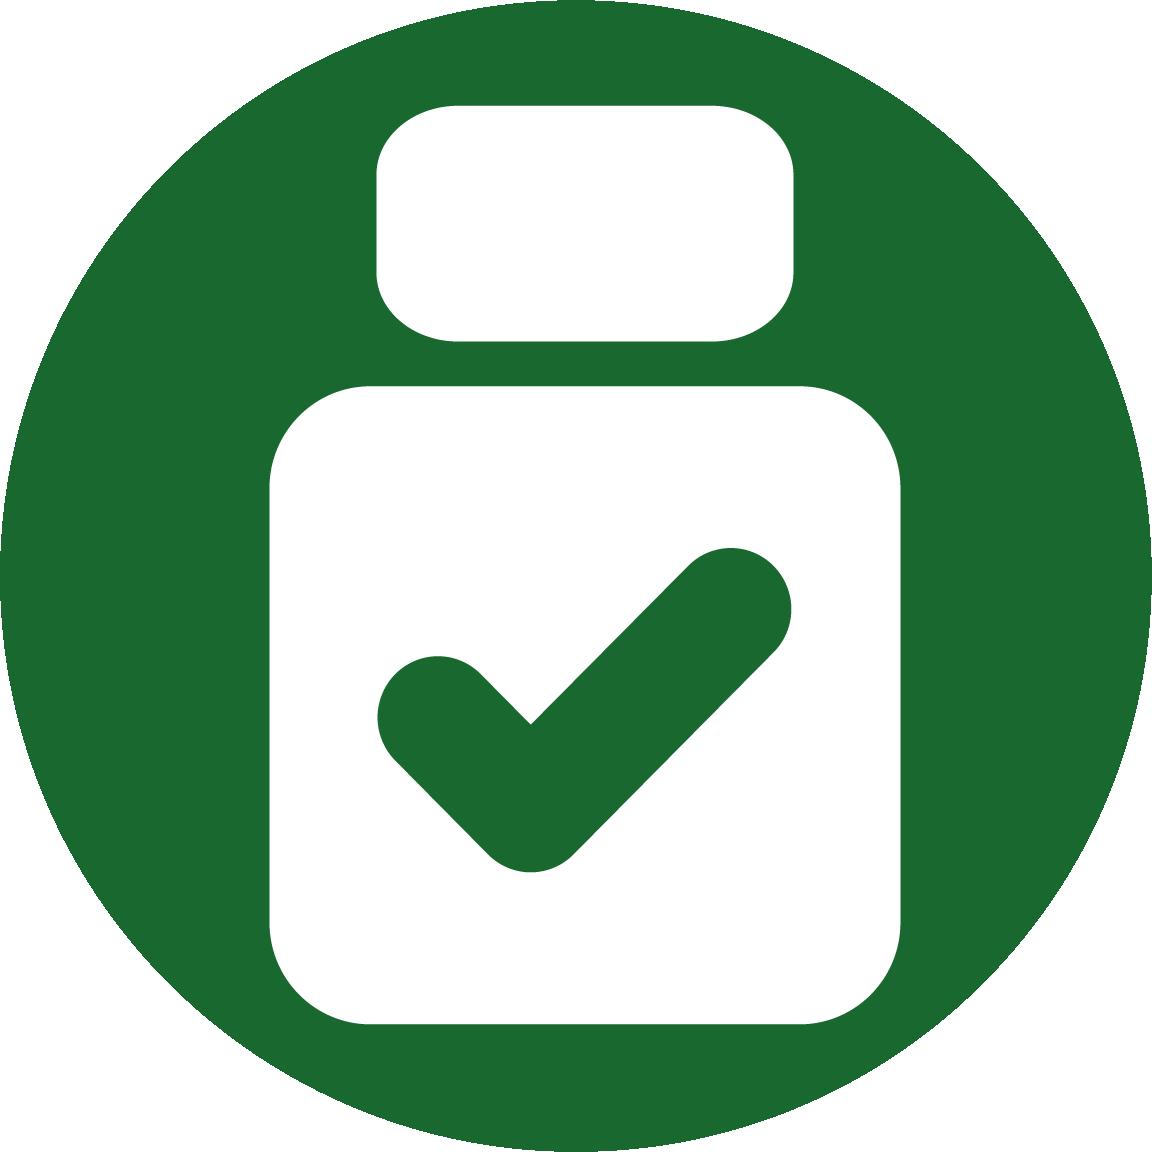 Pills clipart diabetes medication. Medicines check up lloydspharmacy